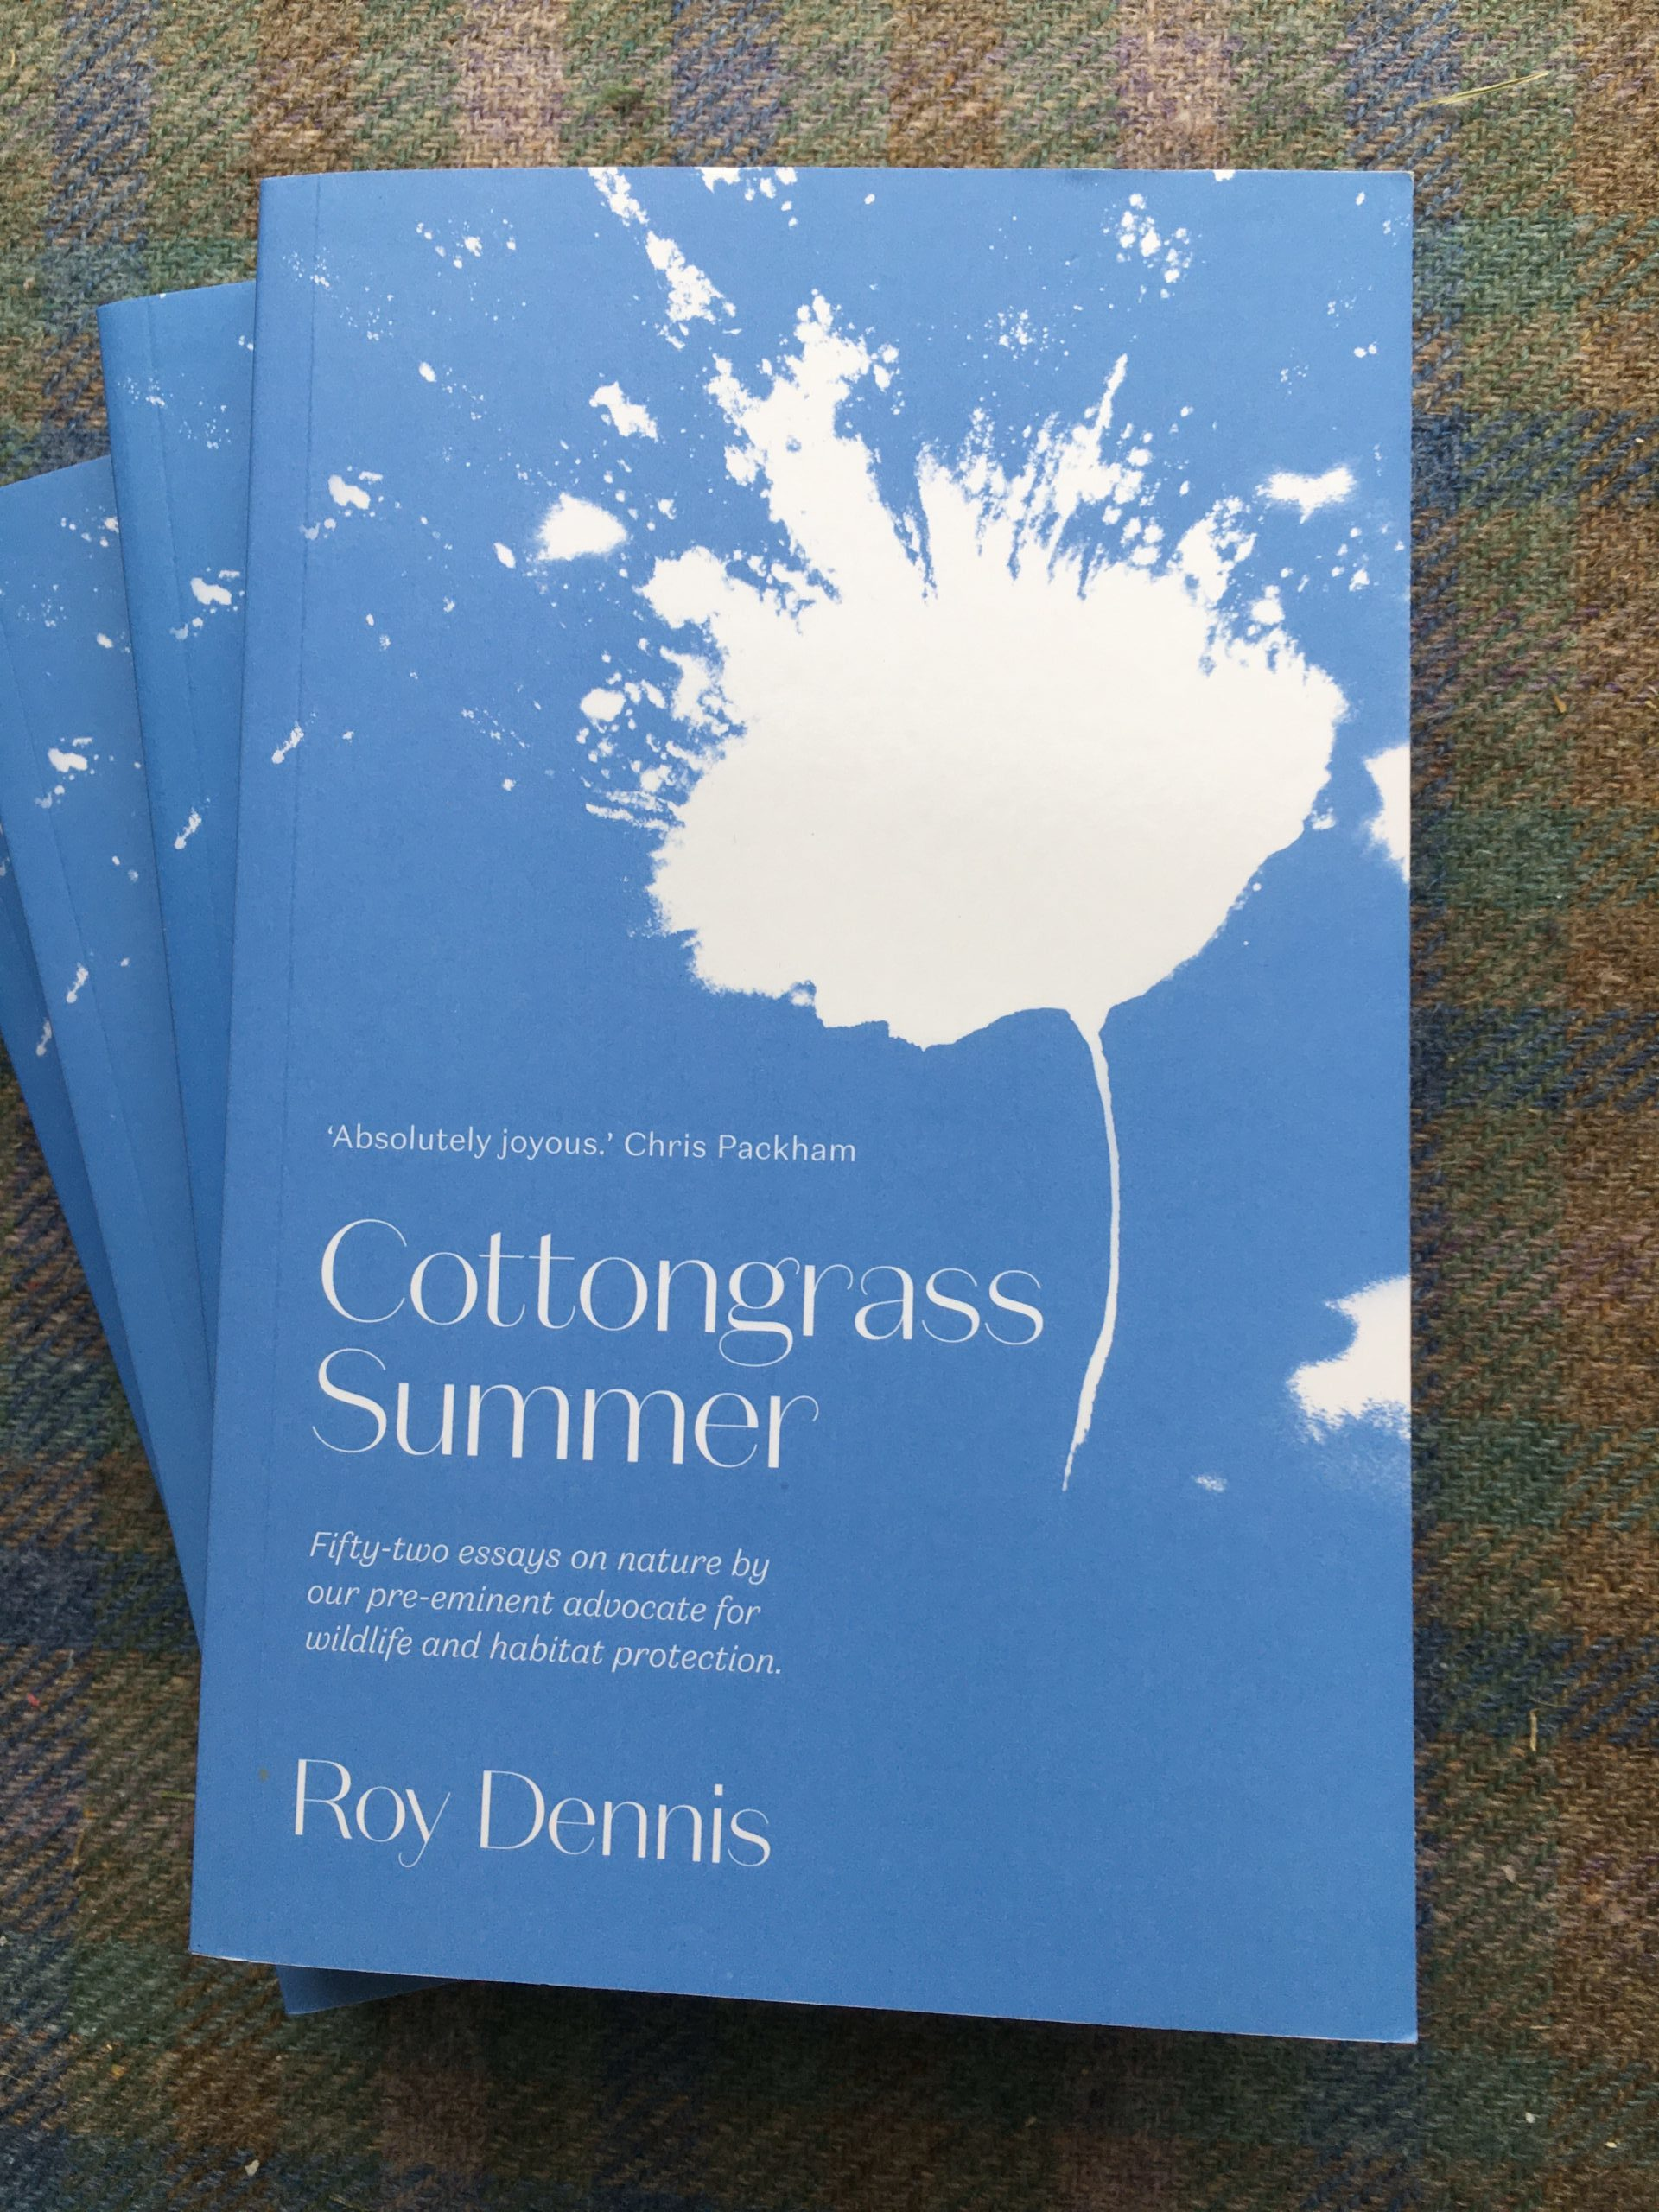 Cottongrass Summer by Roy Dennis